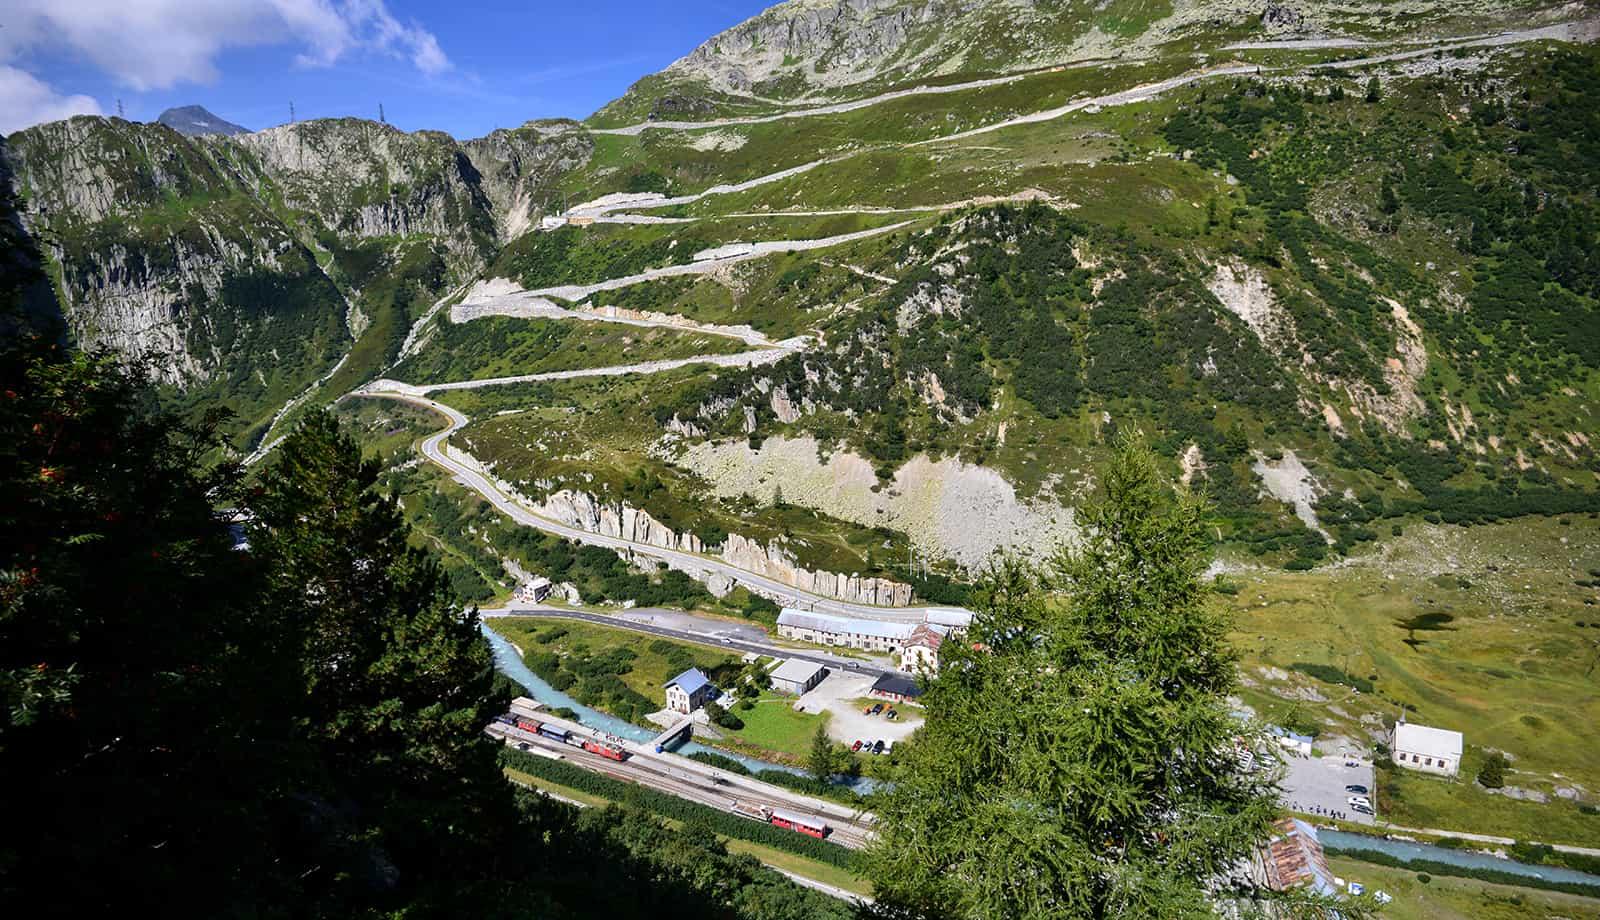 Furka Pass, Switzerland – road to drive